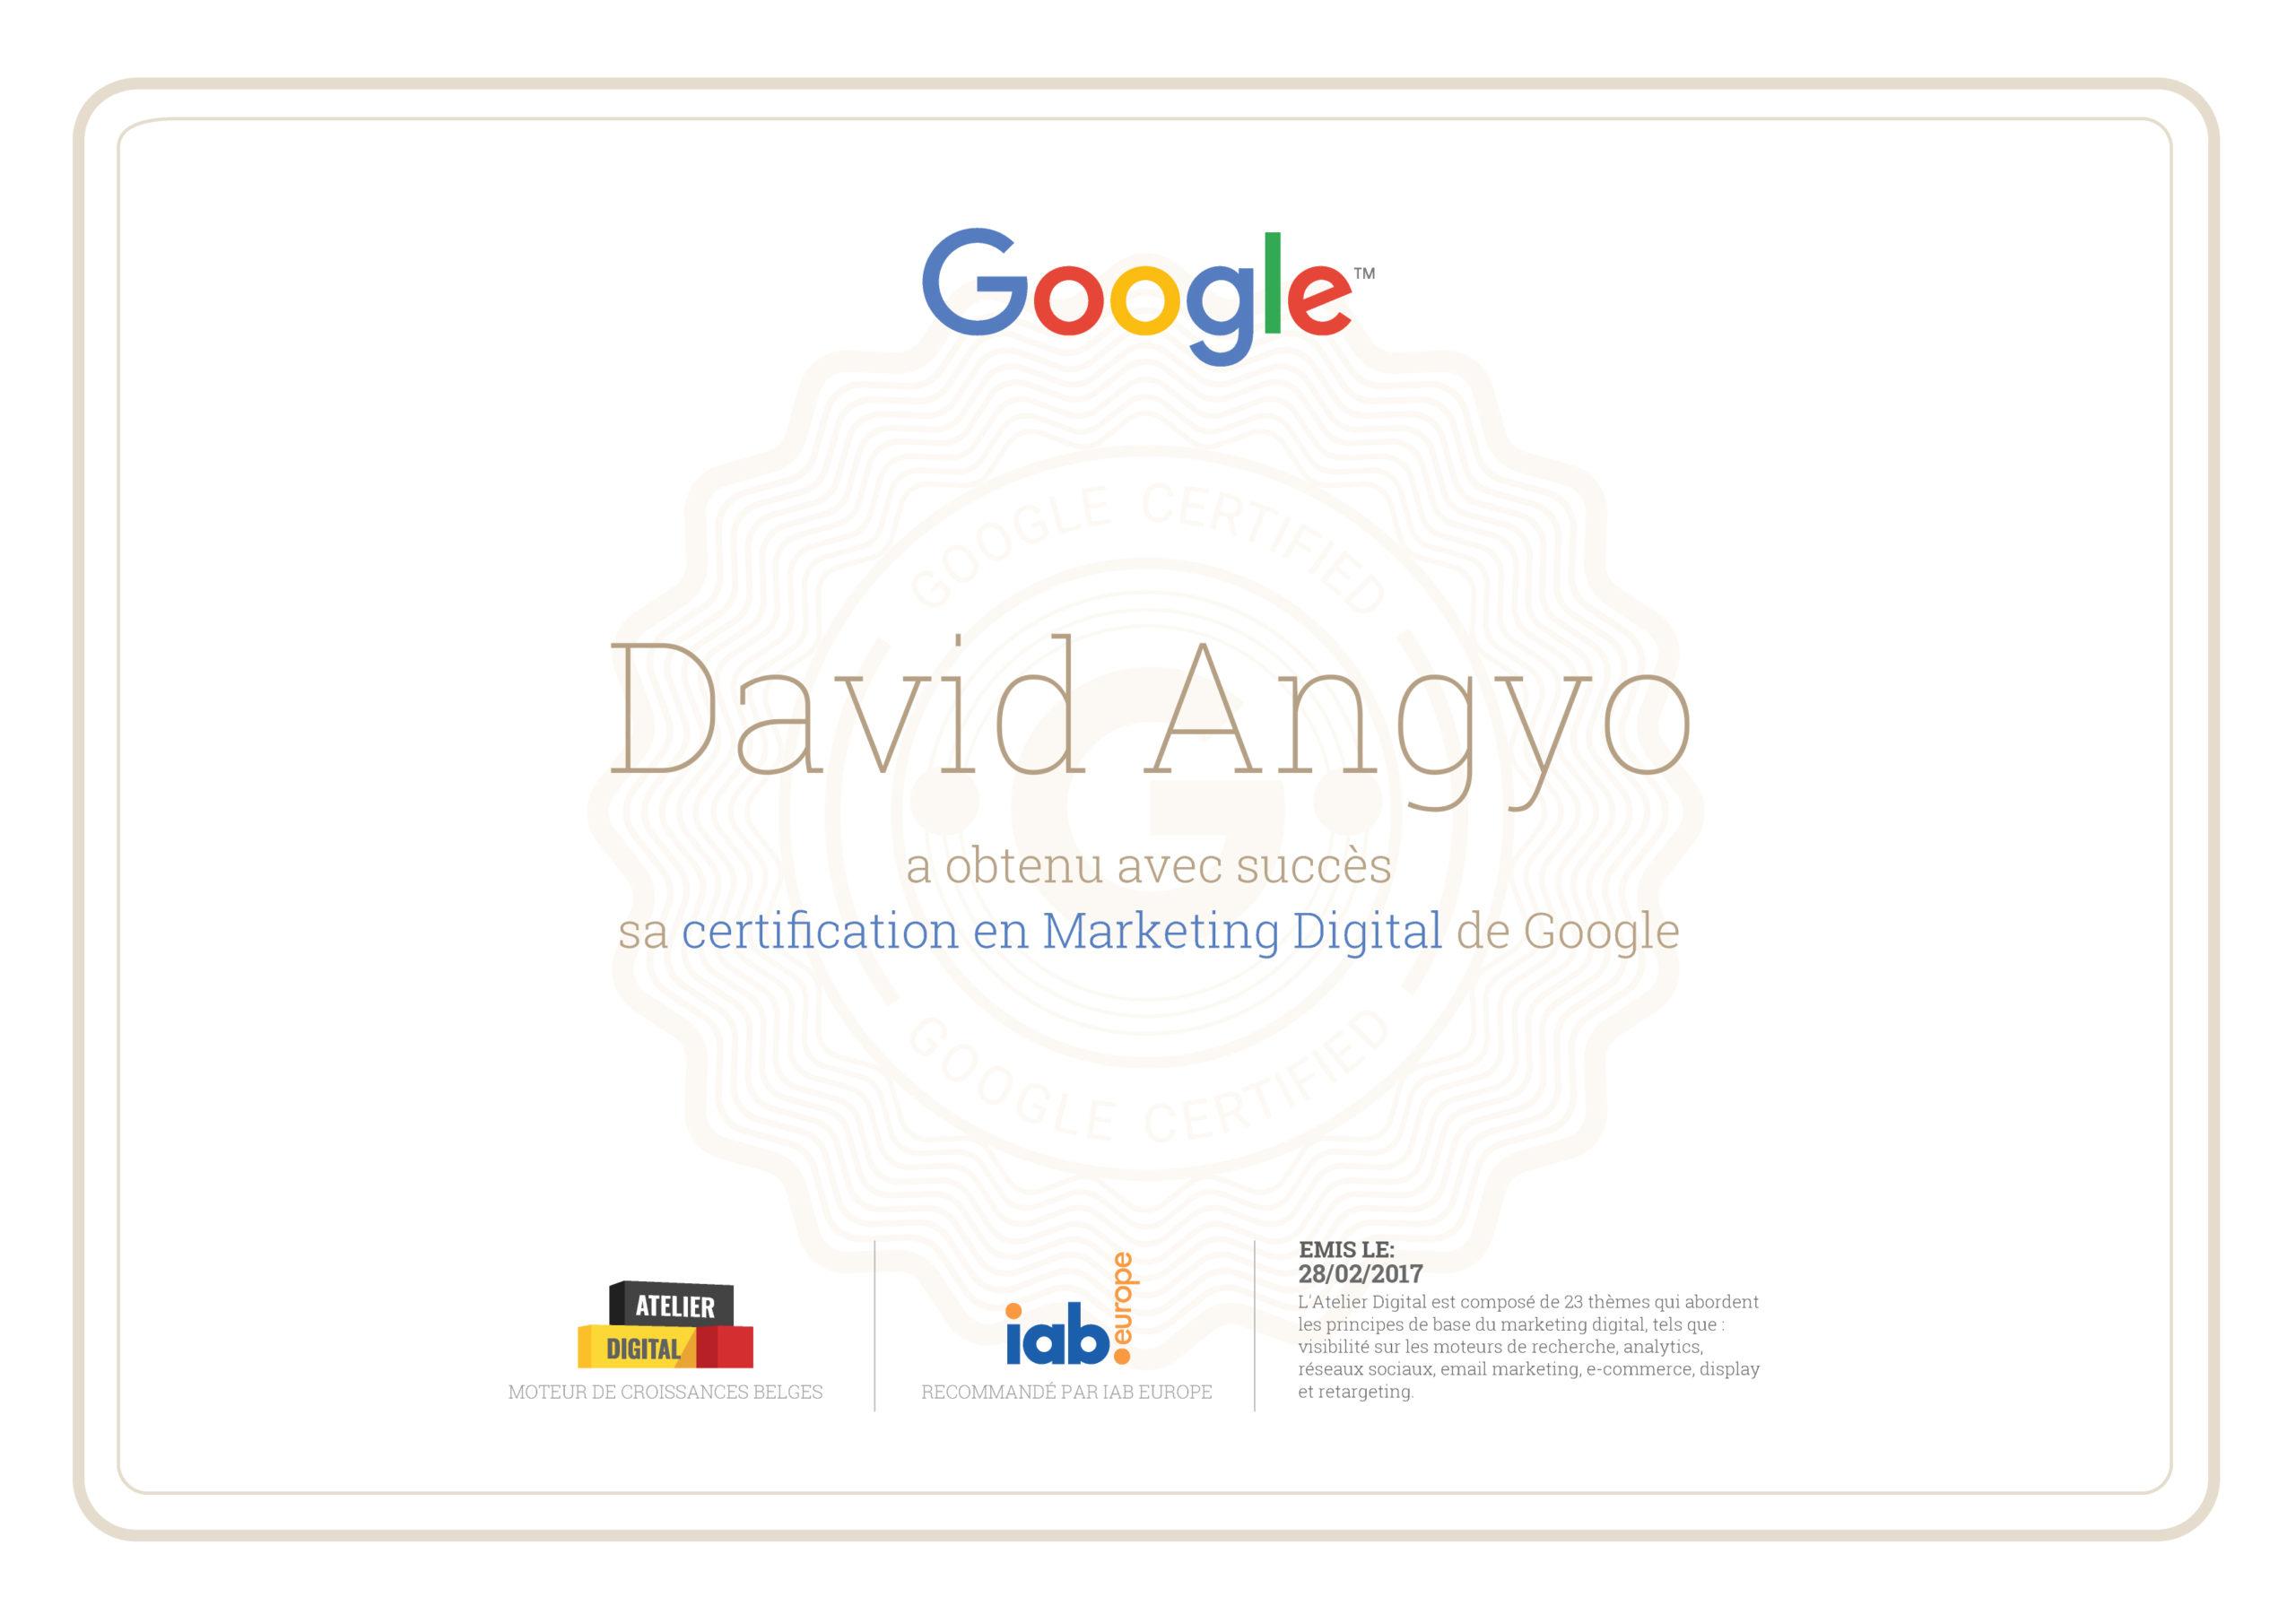 Google Atelier Digital